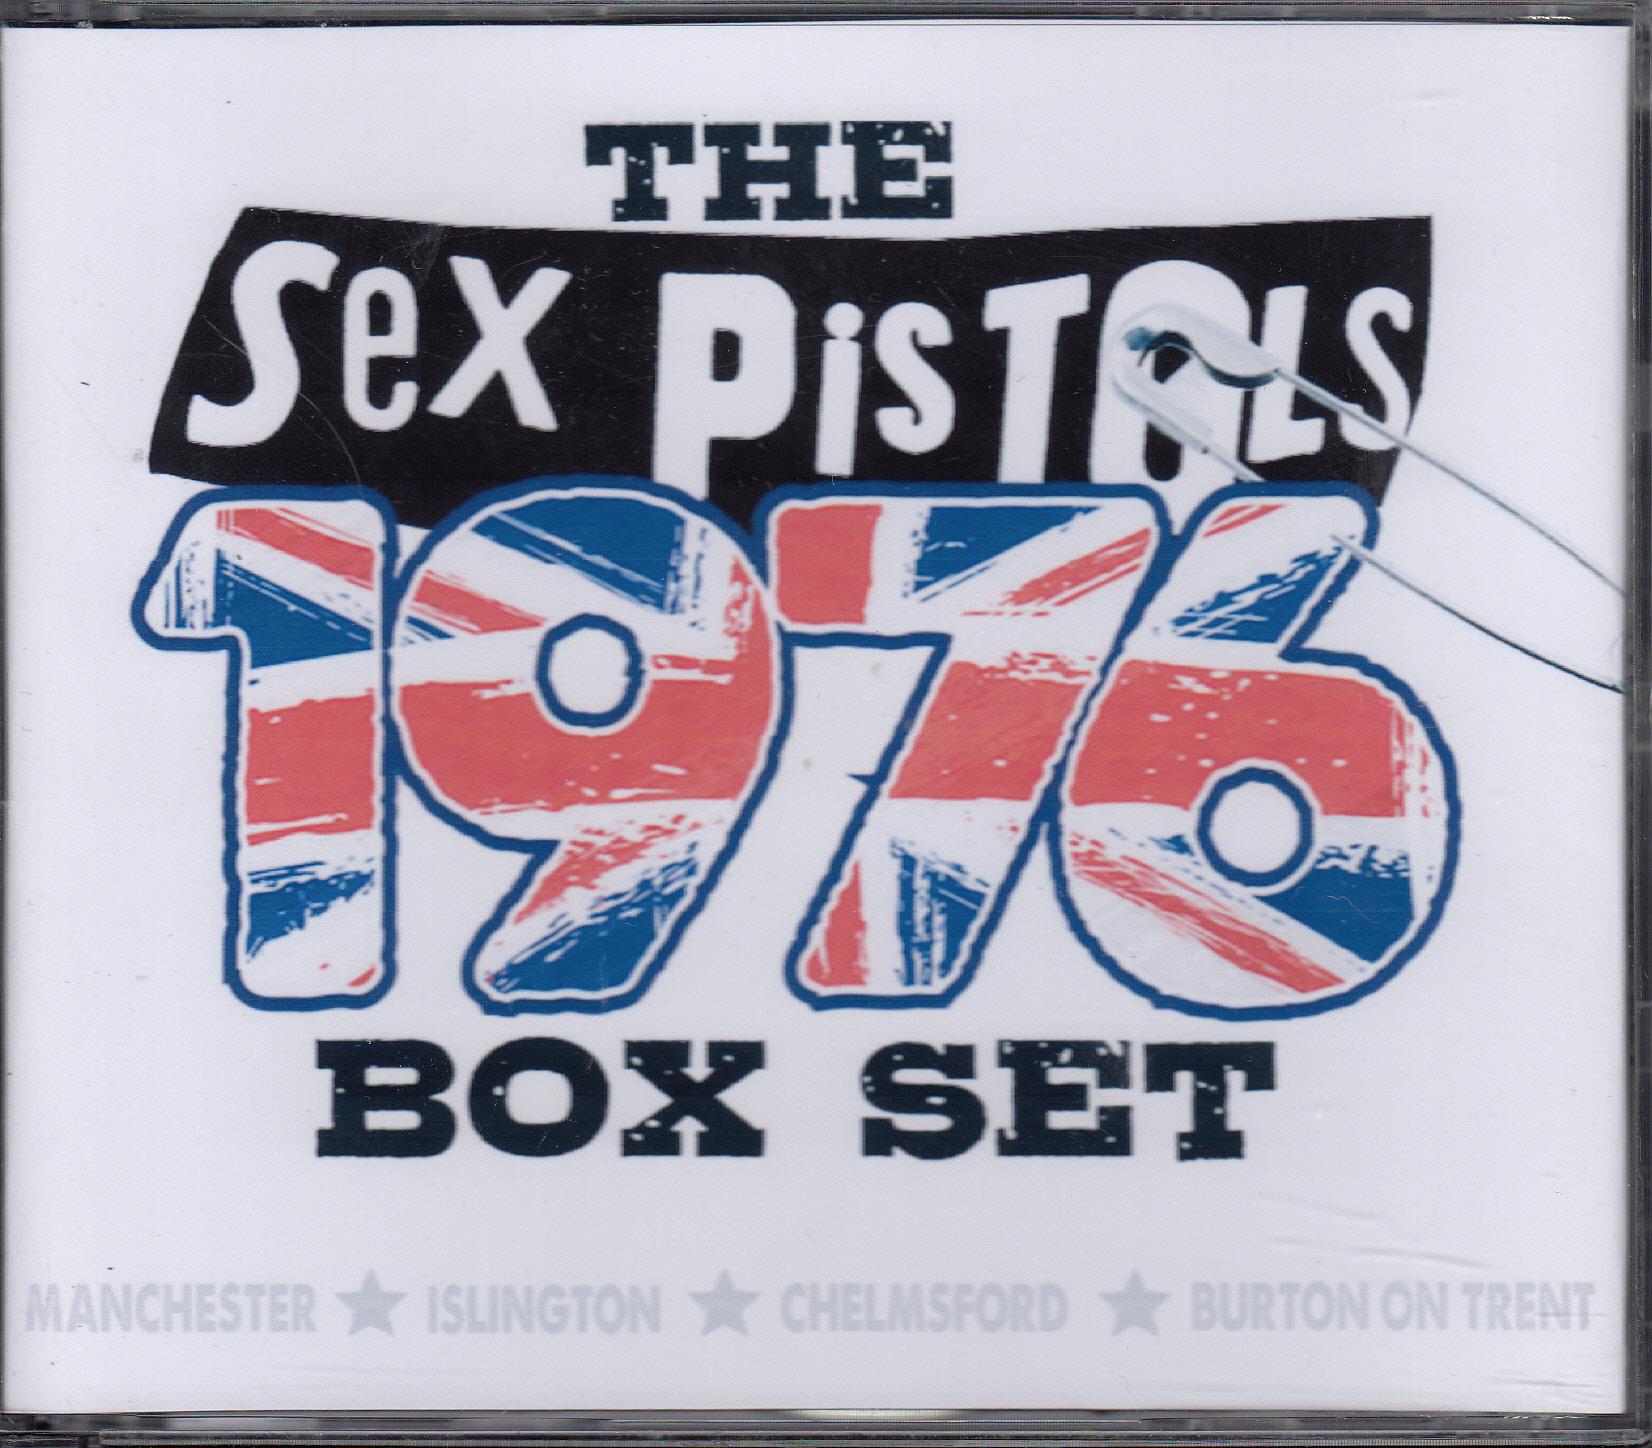 Sex Pistols - Home Facebook